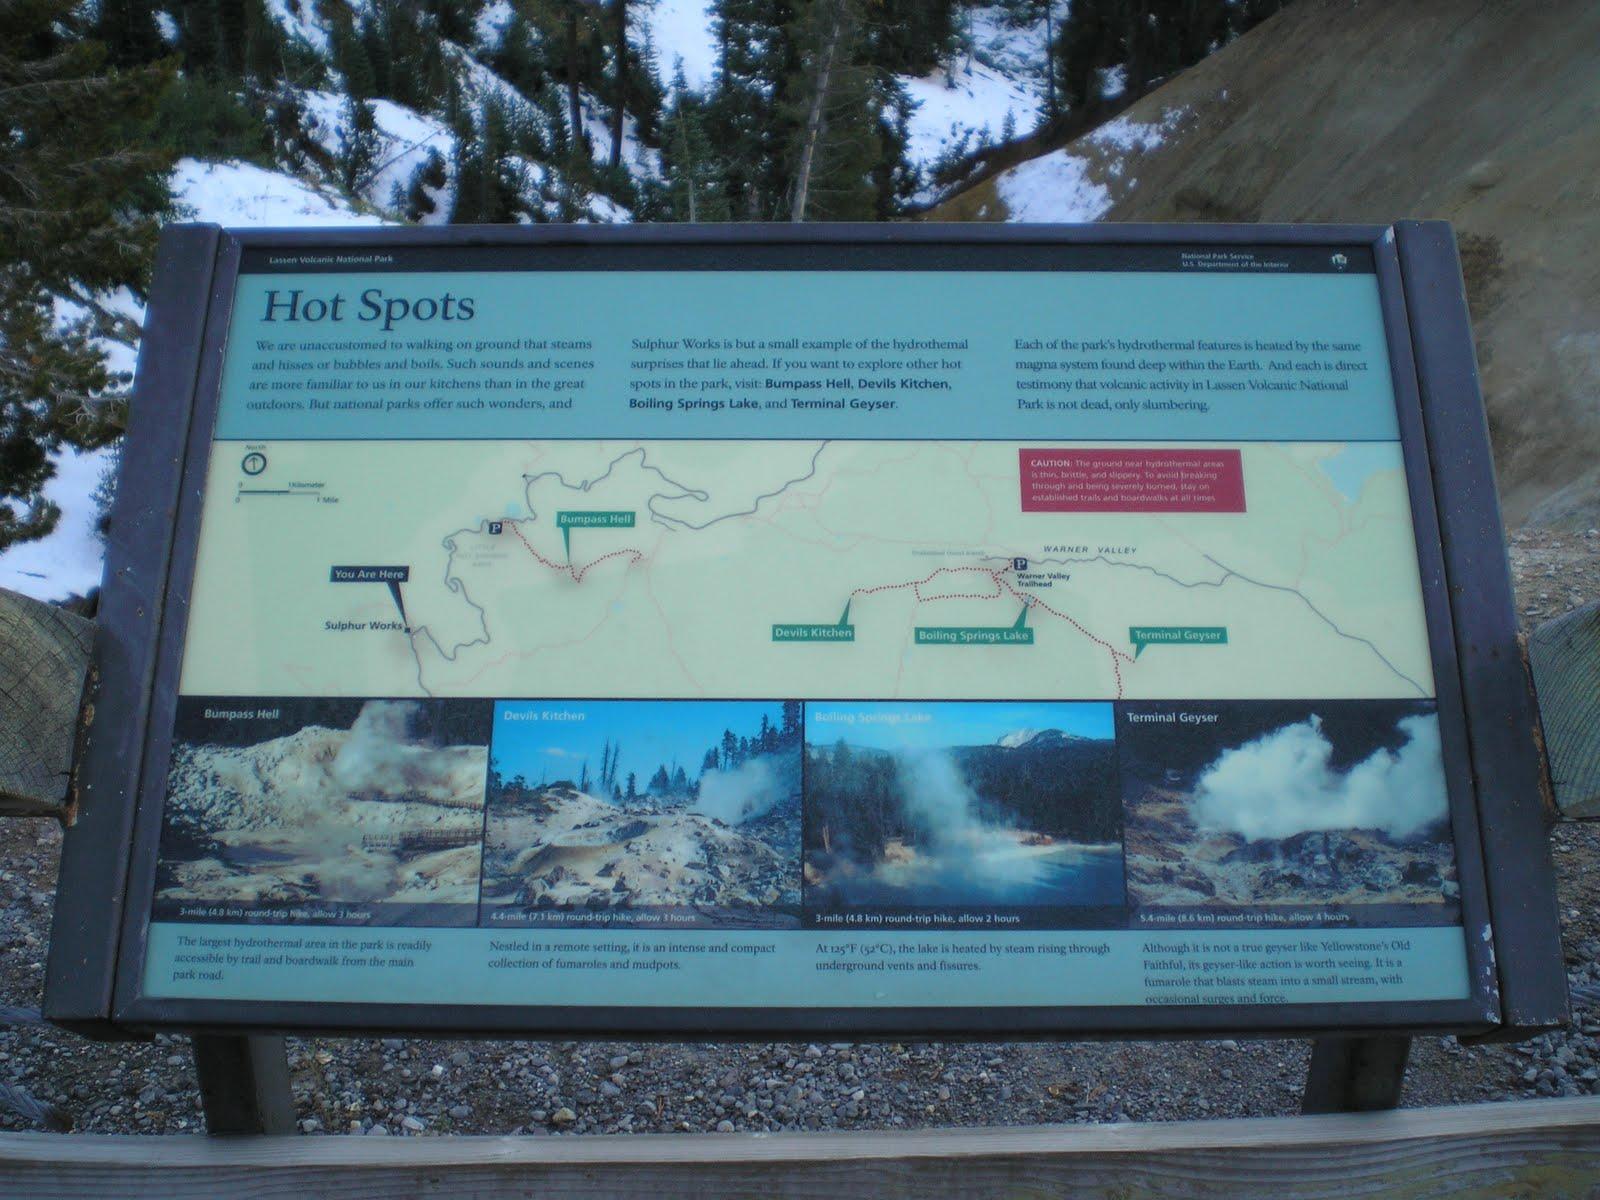 The Road Genealogist: Lassen Volcanic National Park Redux